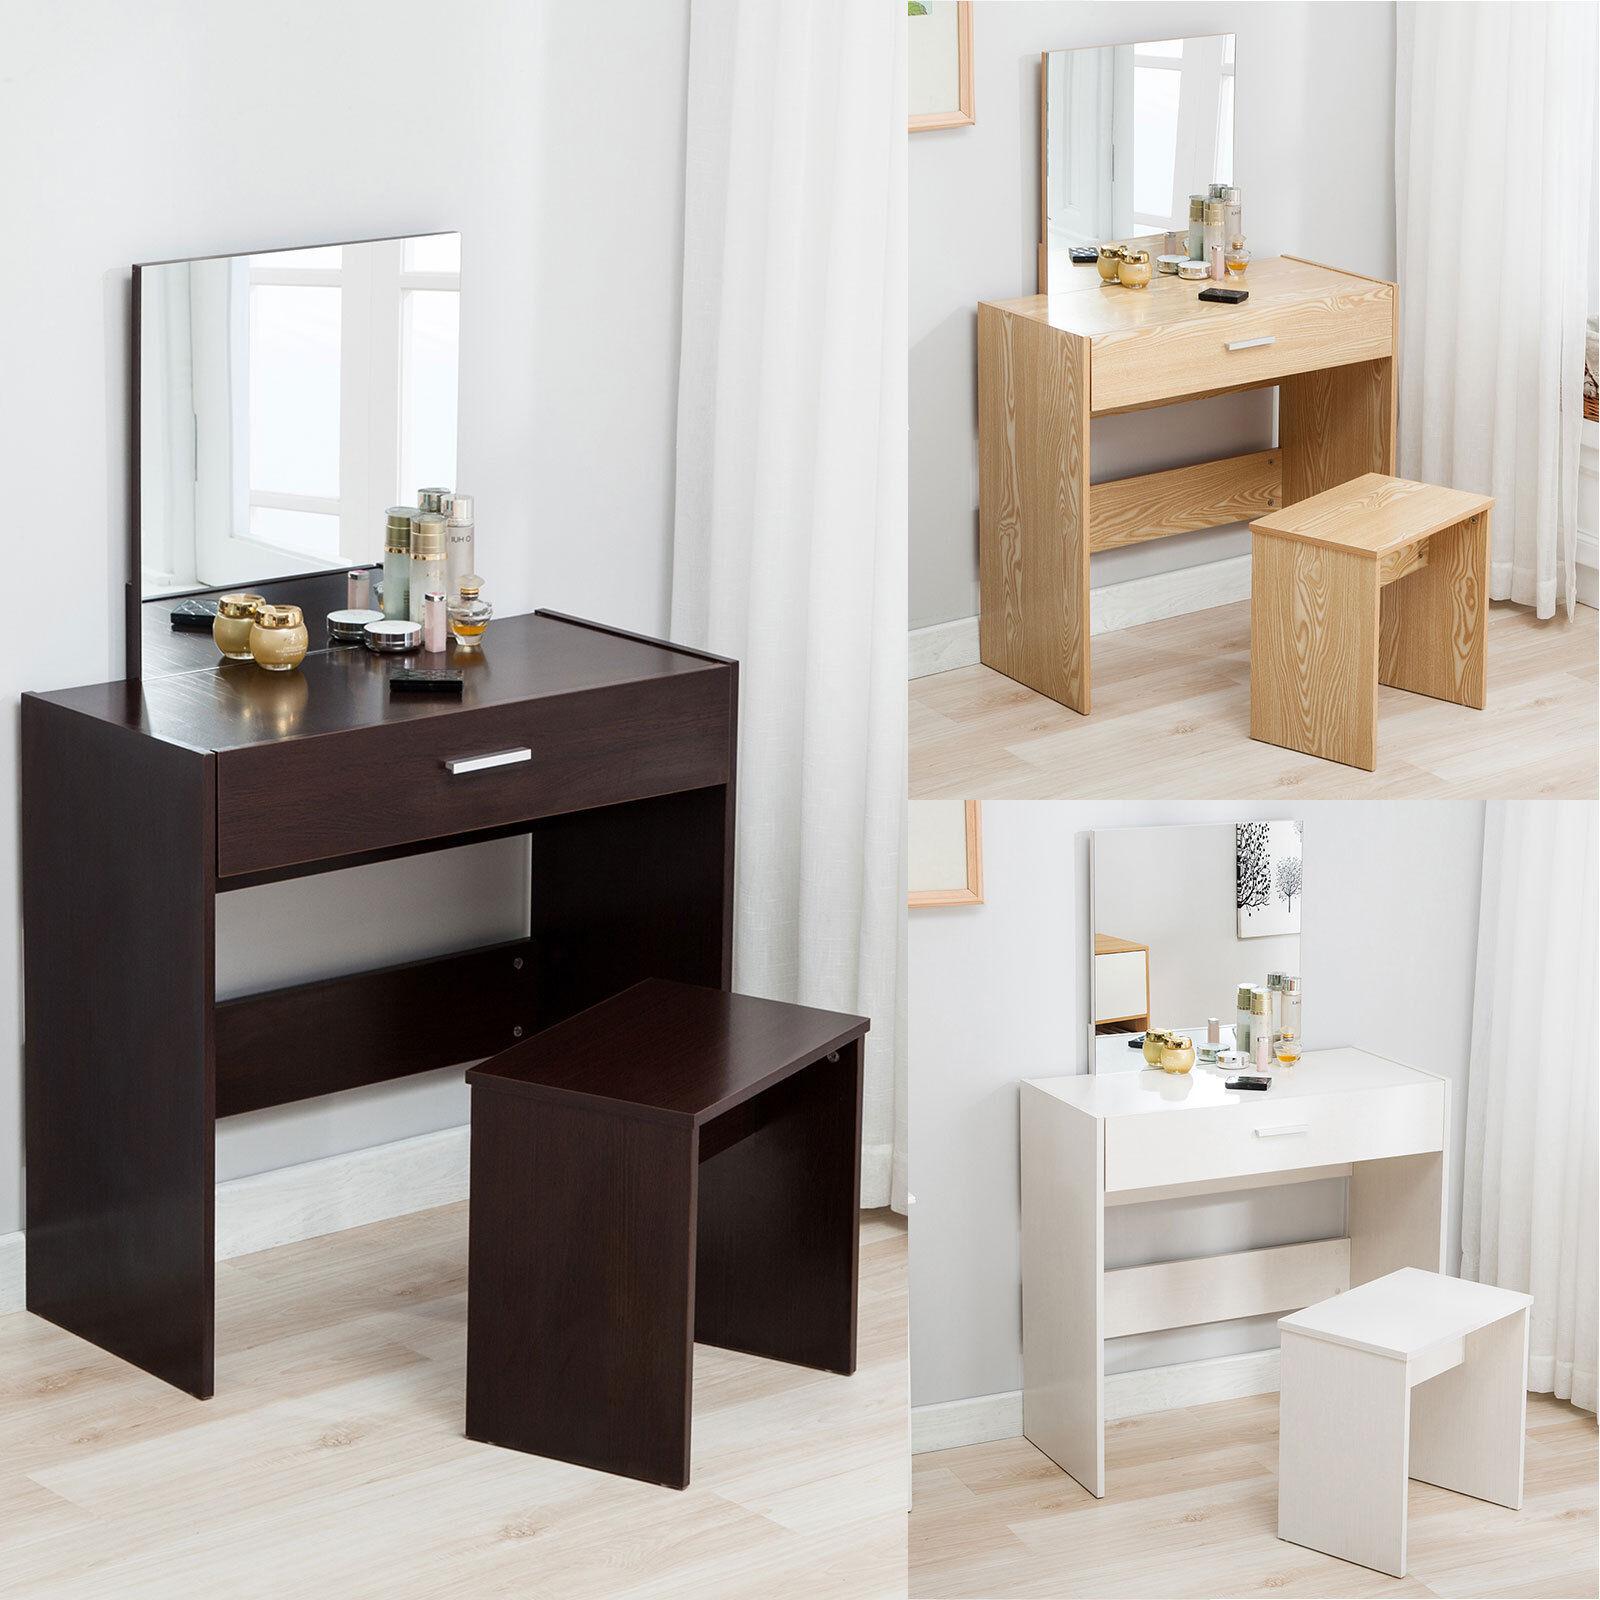 Vanity Dressing Desk Makeup Table And Stool Set Dresser W/Mirror Drawer